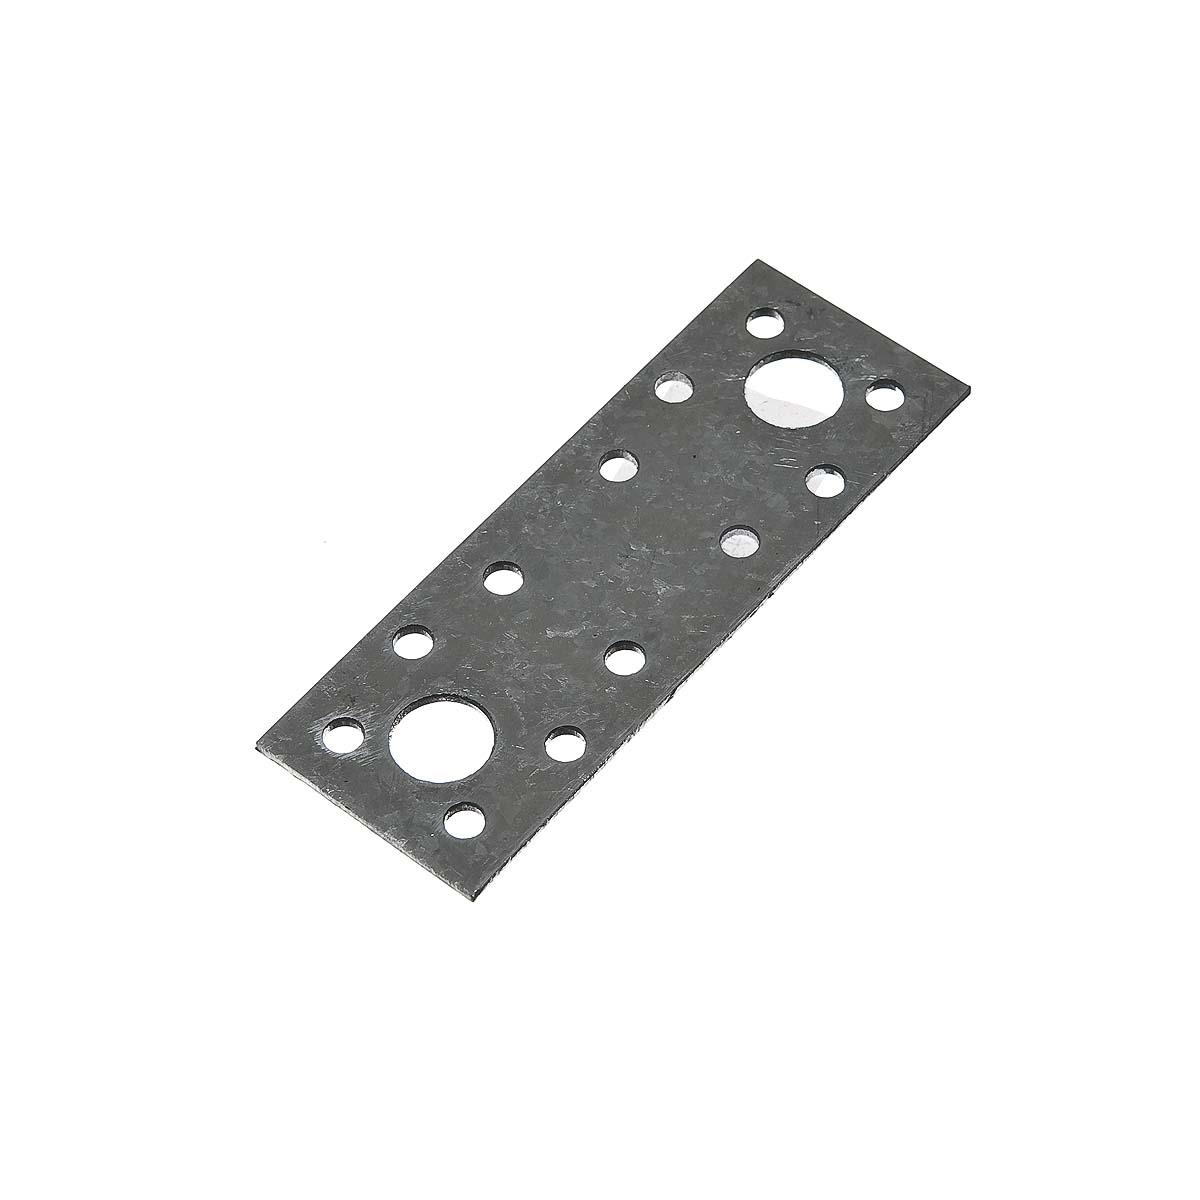 Пластина крепежная оцинкованная 100 х 35 х 2 мм